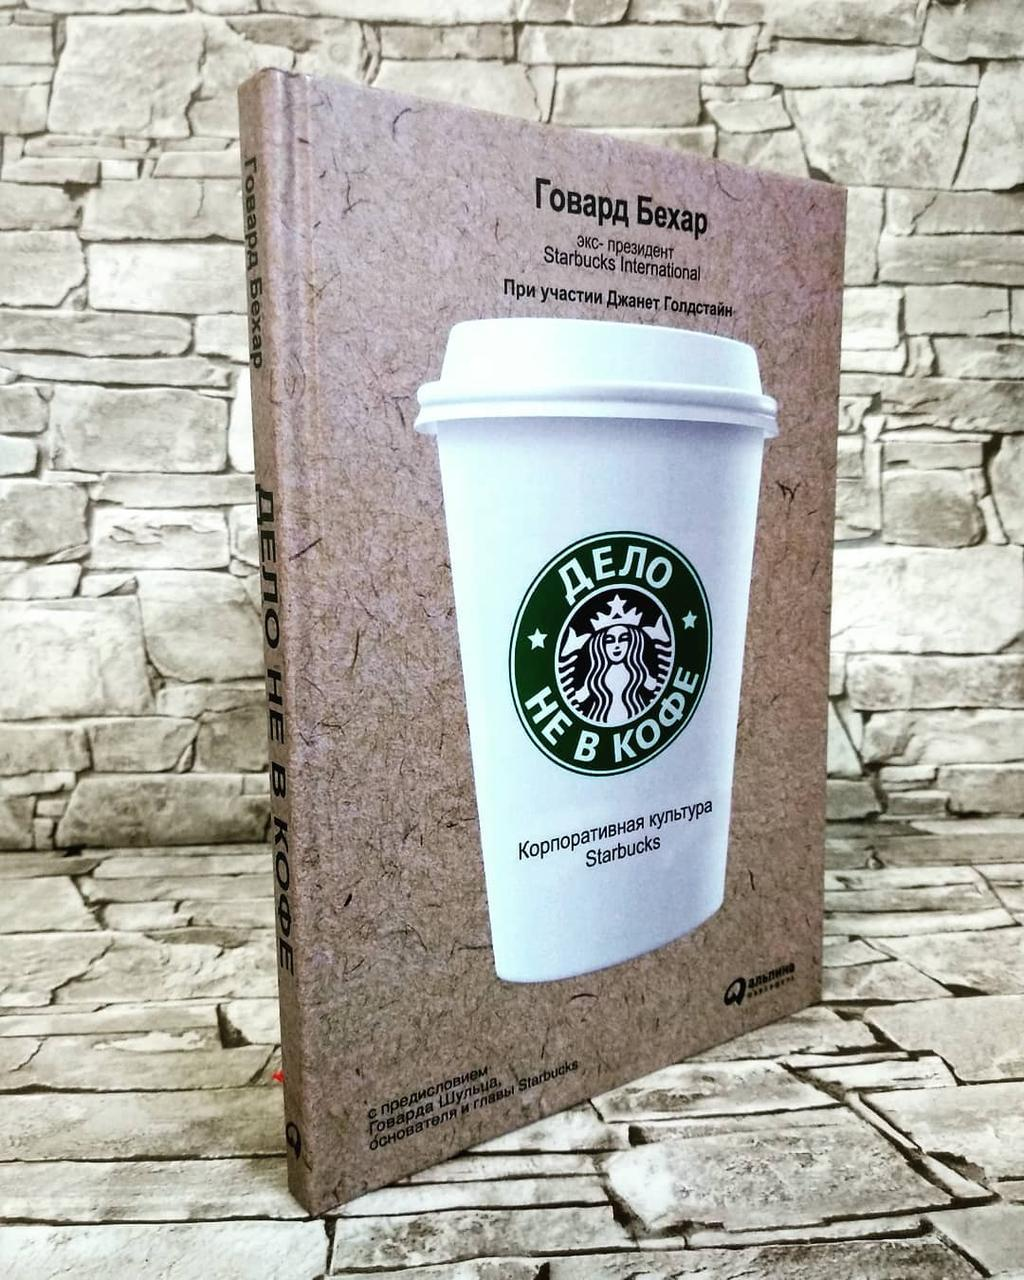 "Книга ""Дело не в кофе. Корпоративная культура Starbucks"" Говард Бехар. Бестселлер"